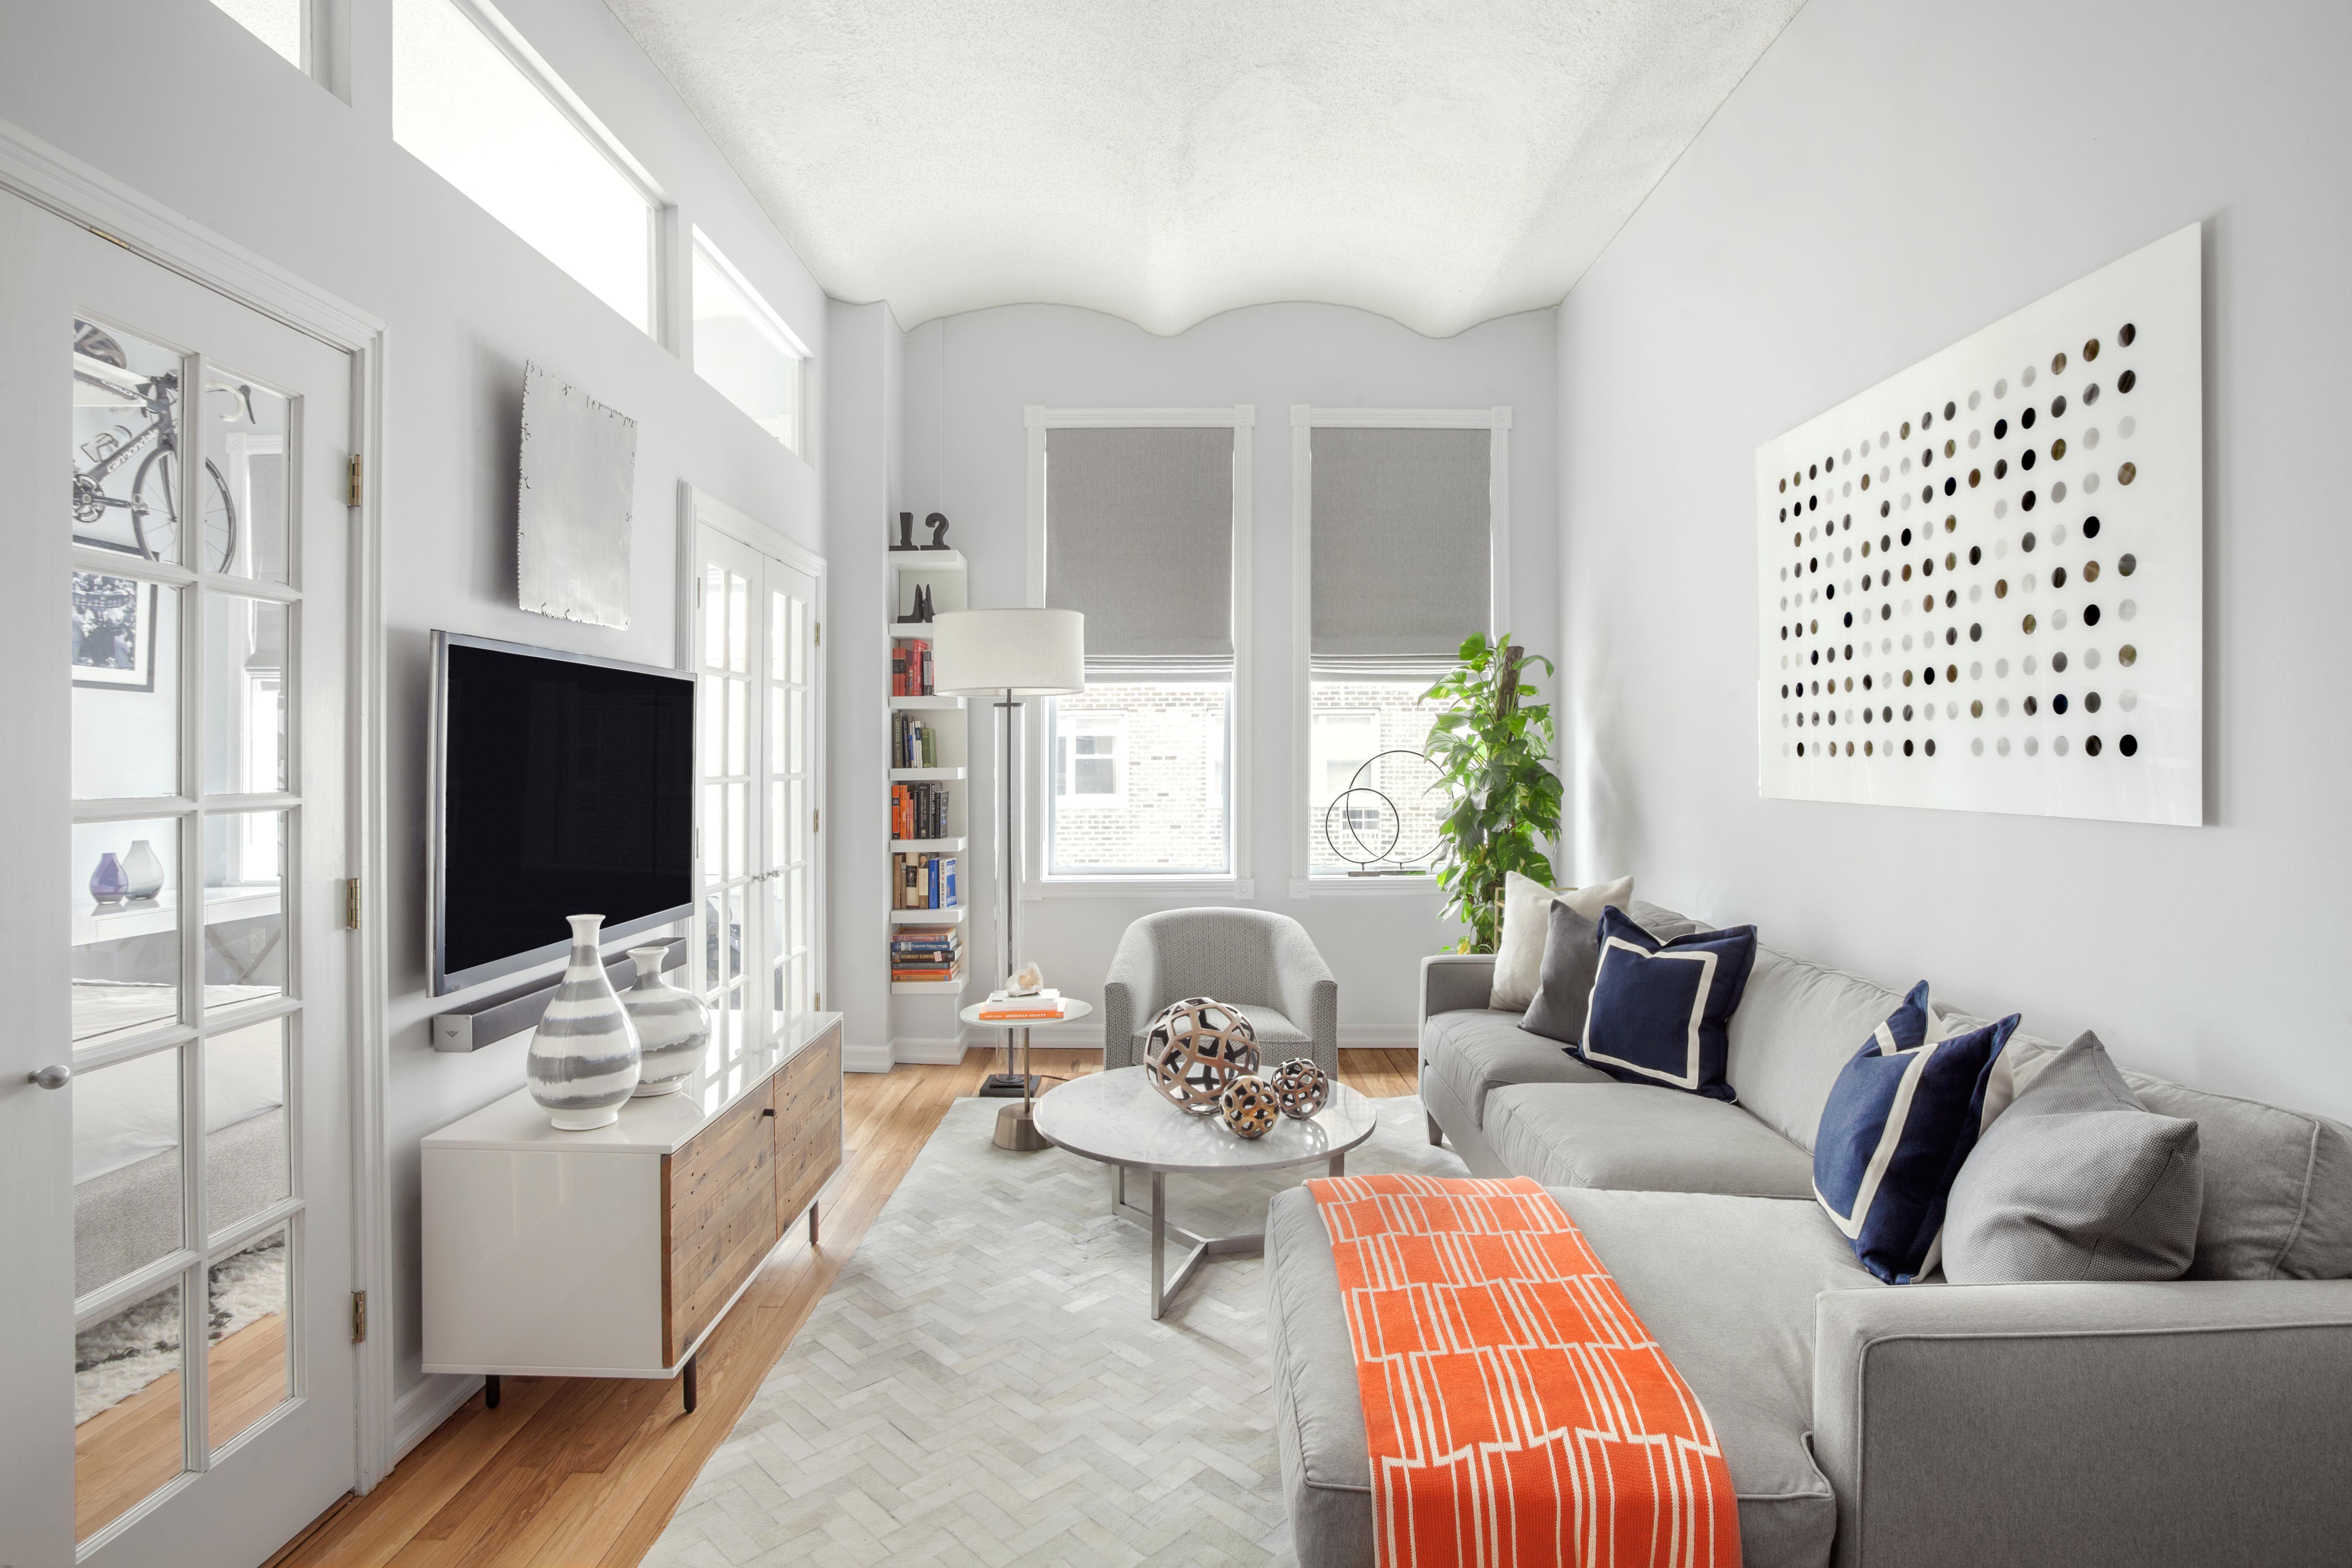 13 Genius Ways How To Build Living Room Accessories Set Narrow